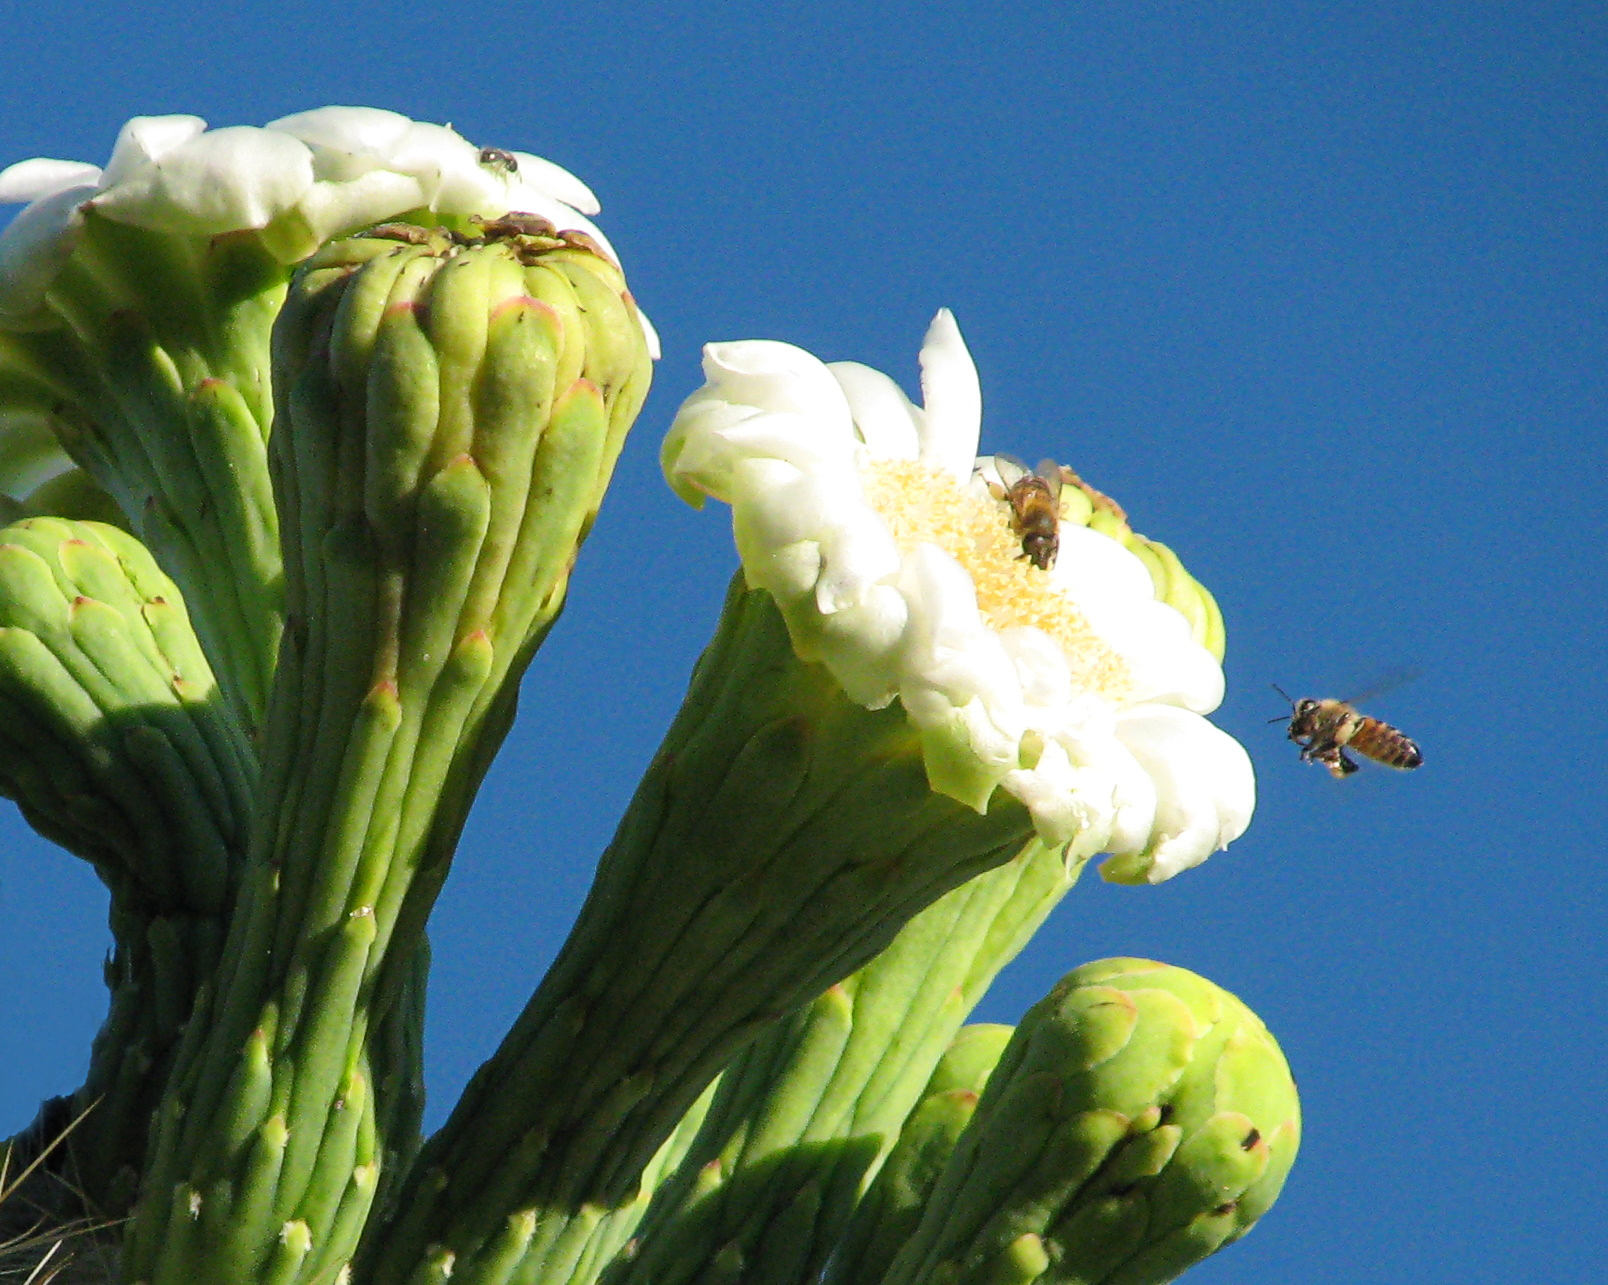 Daylight pollination of the saguaro cactus